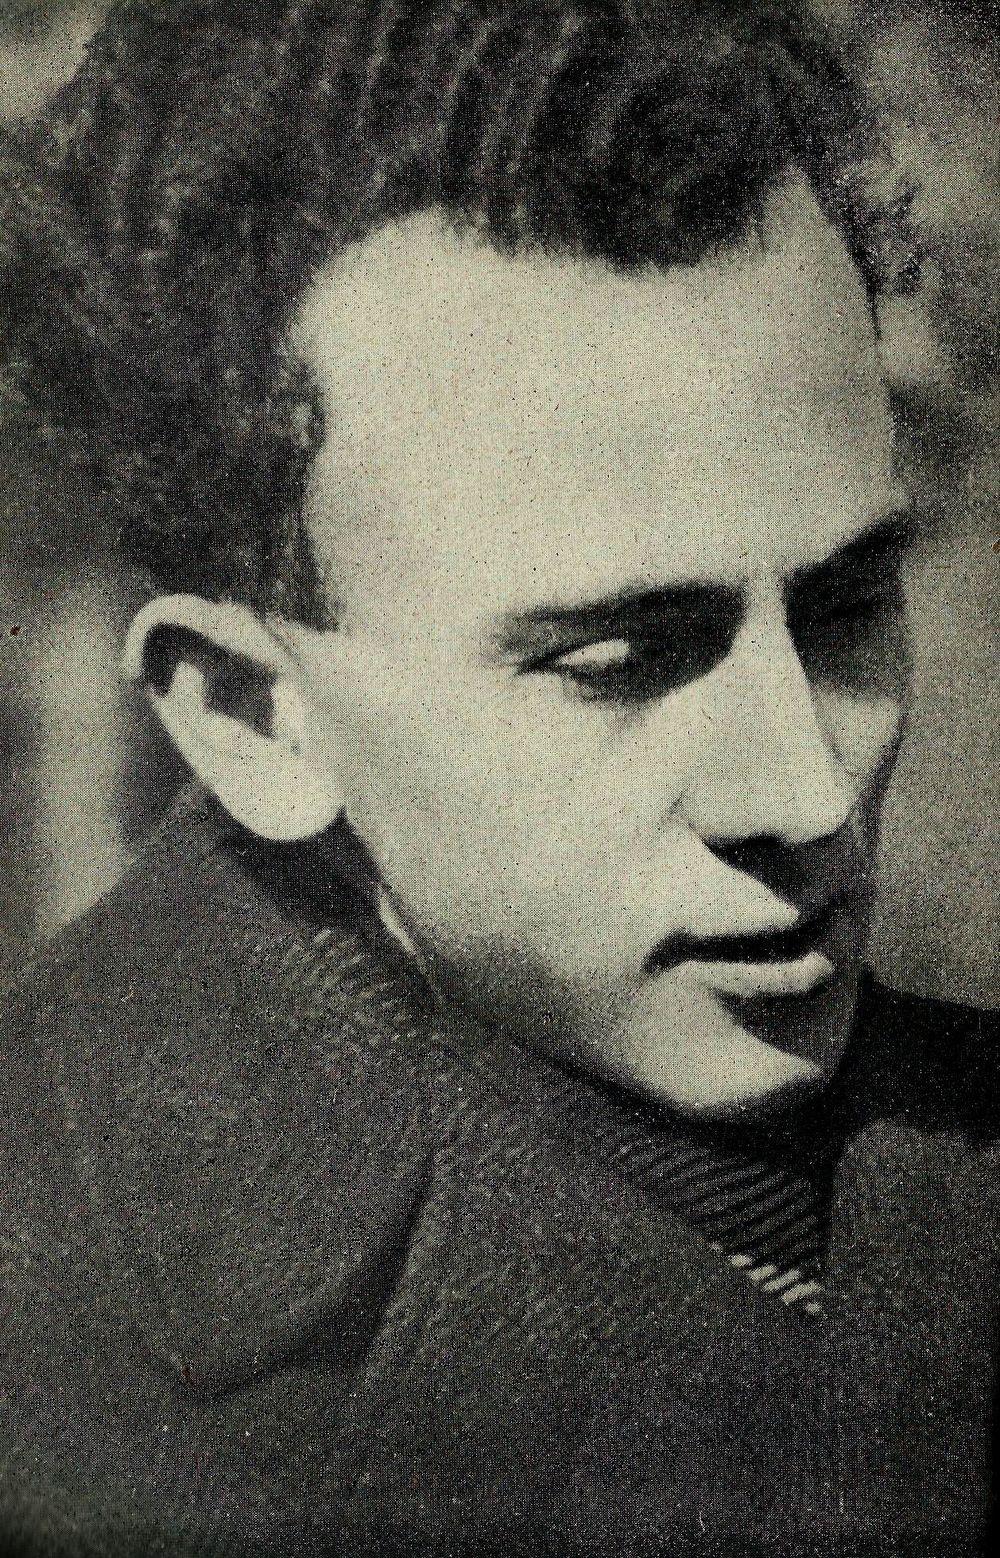 Jiří Orten.